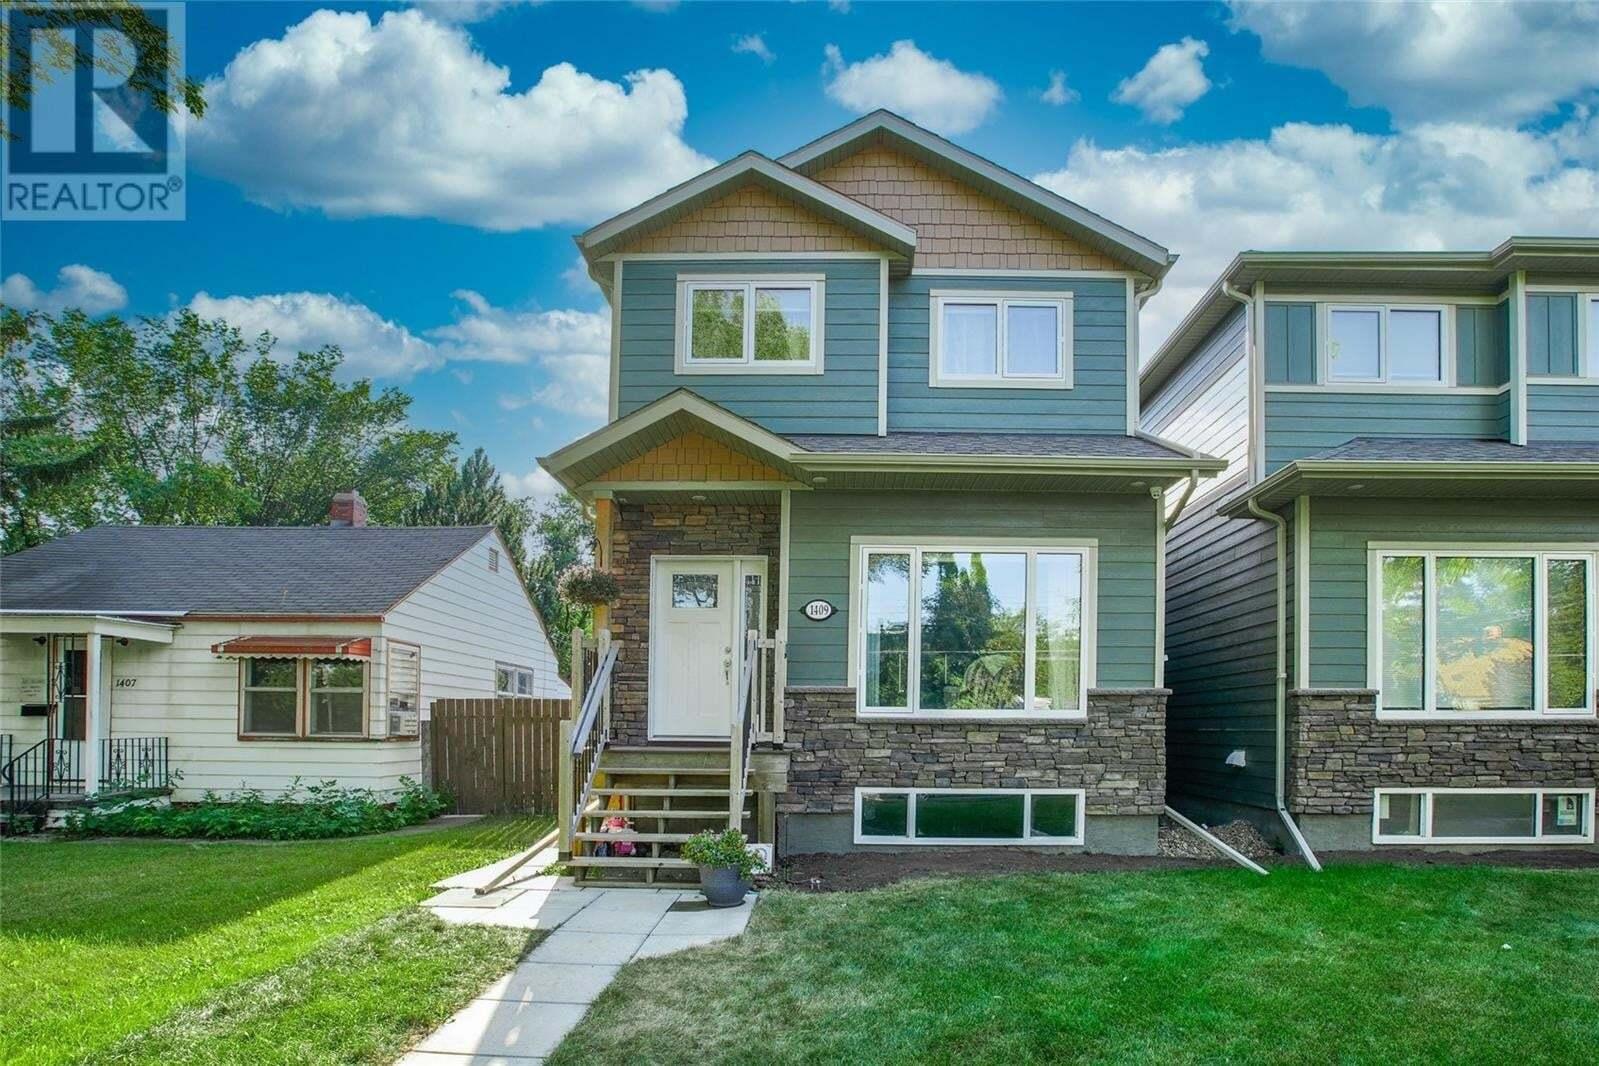 House for sale at 1409 2nd Ave N Saskatoon Saskatchewan - MLS: SK822224